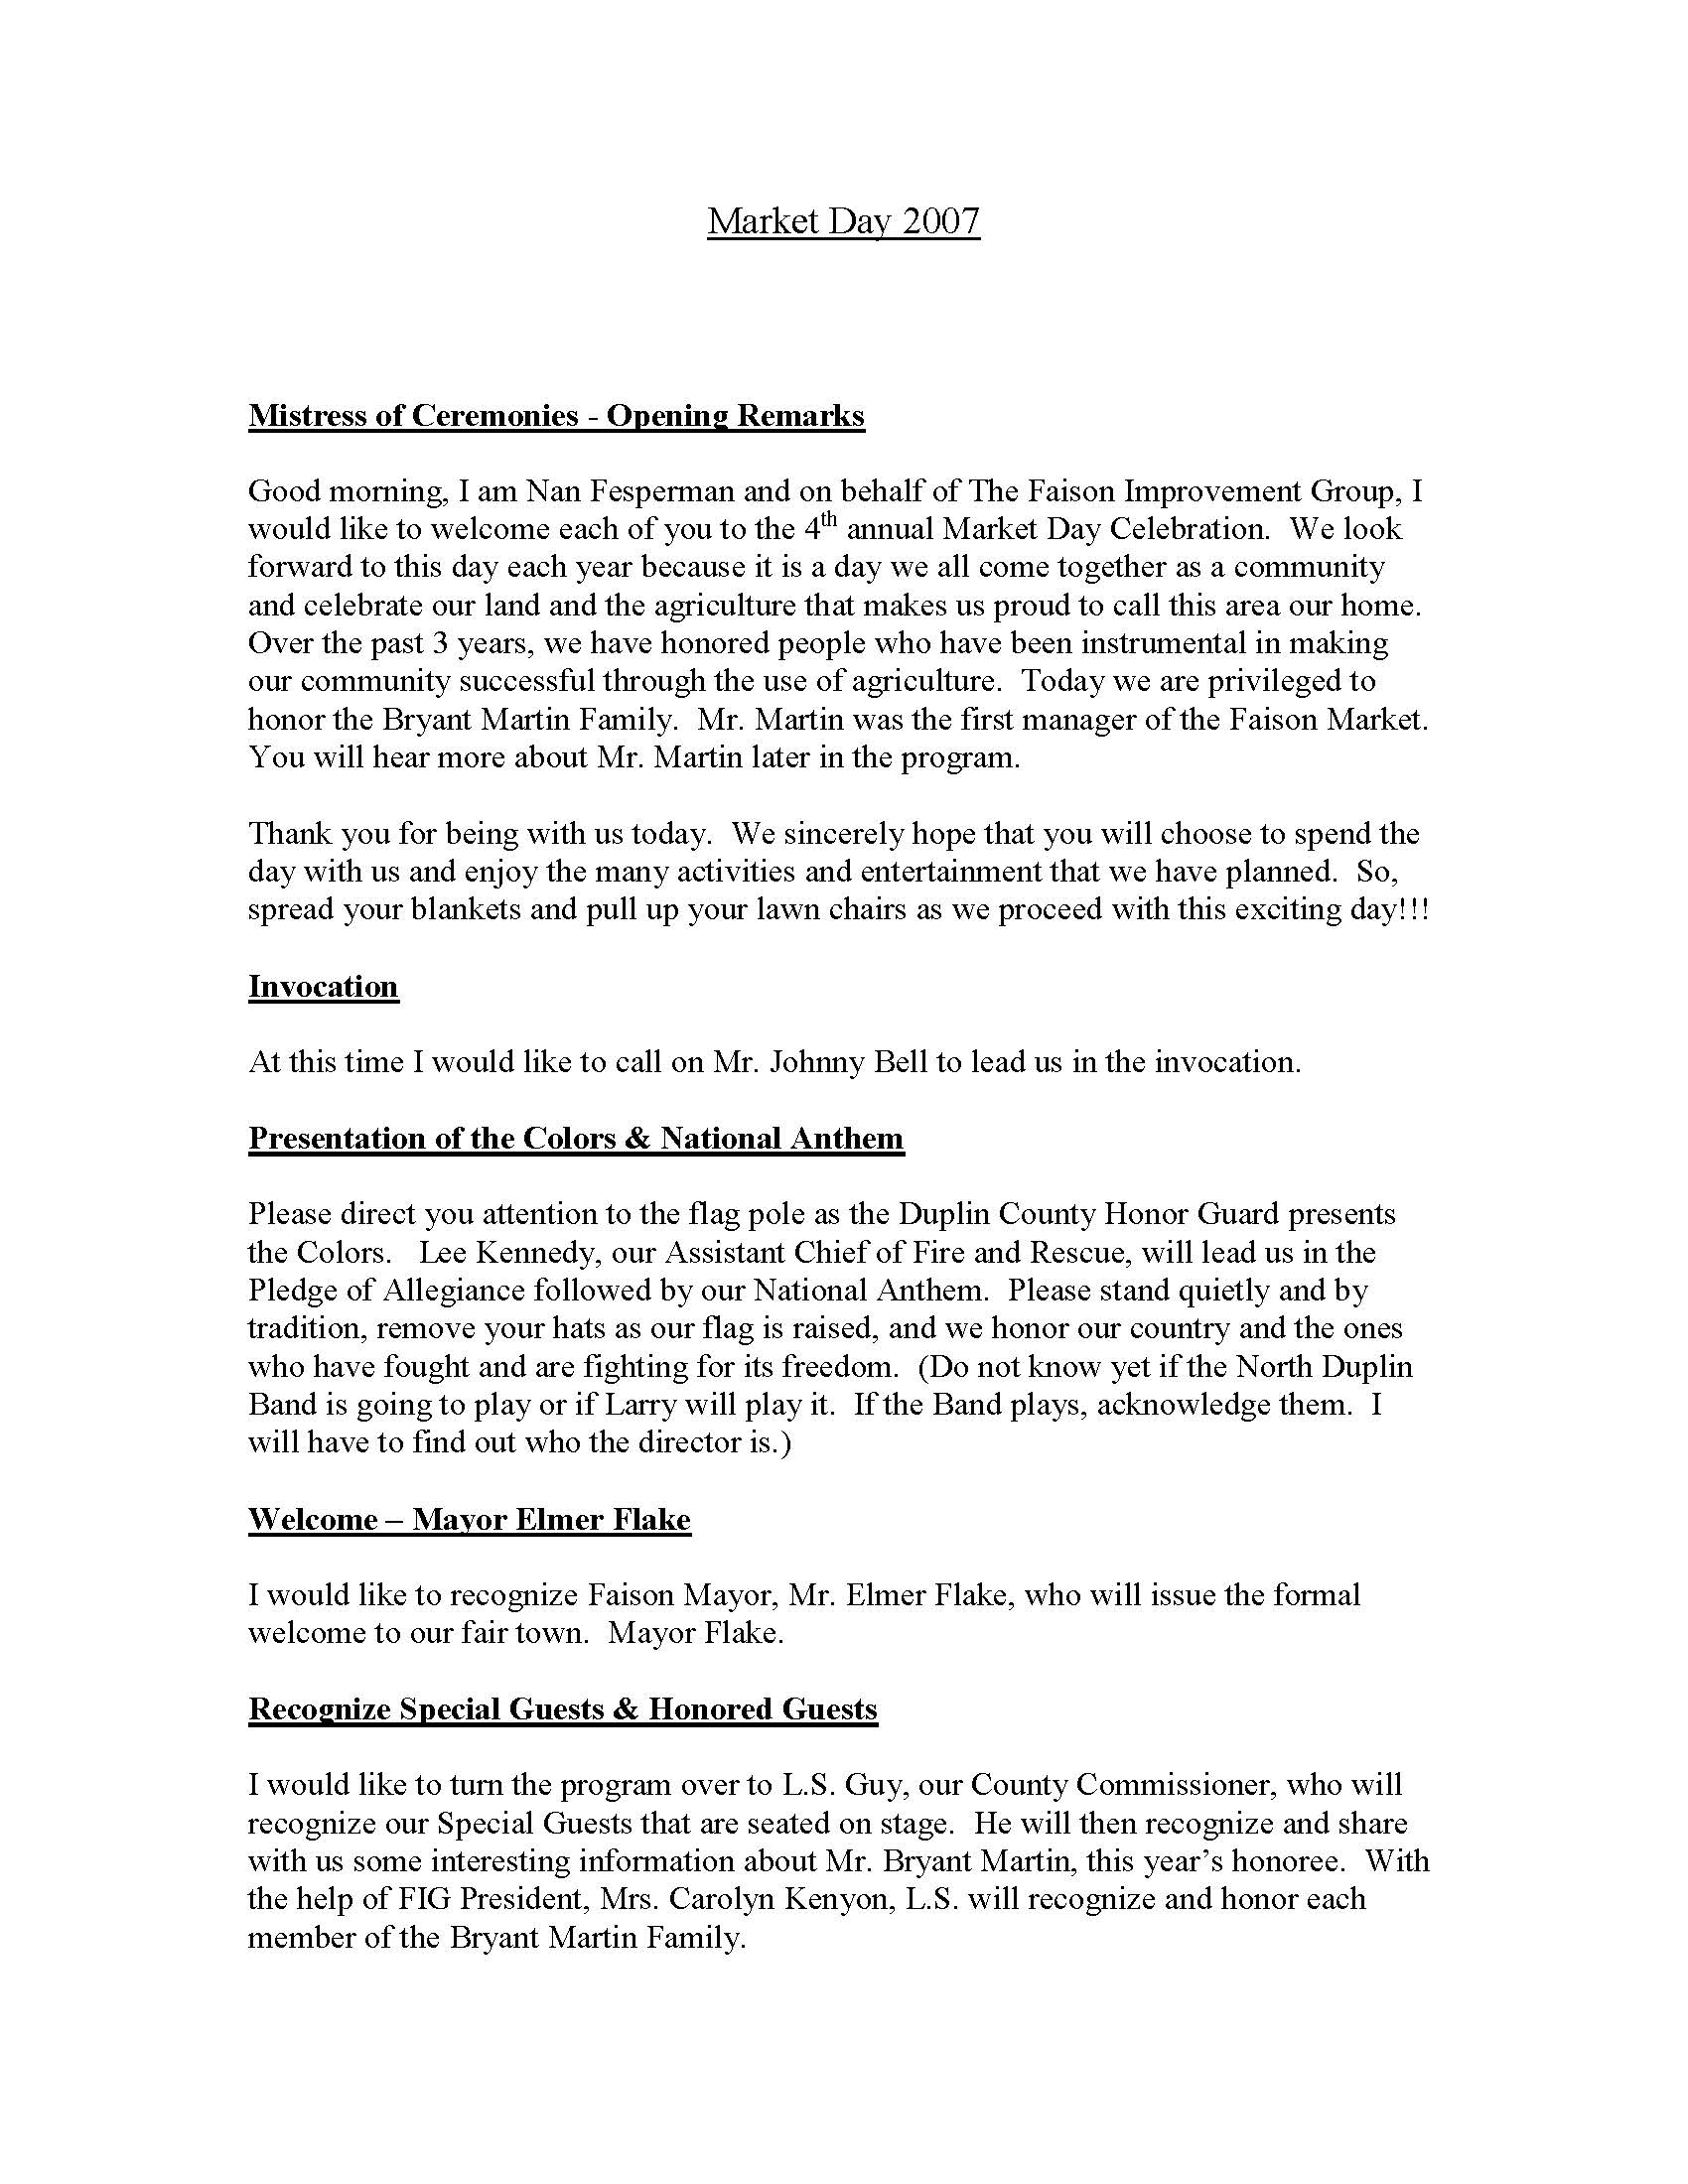 6_3_2007_market_day_2007[1]_Page_1.jpg